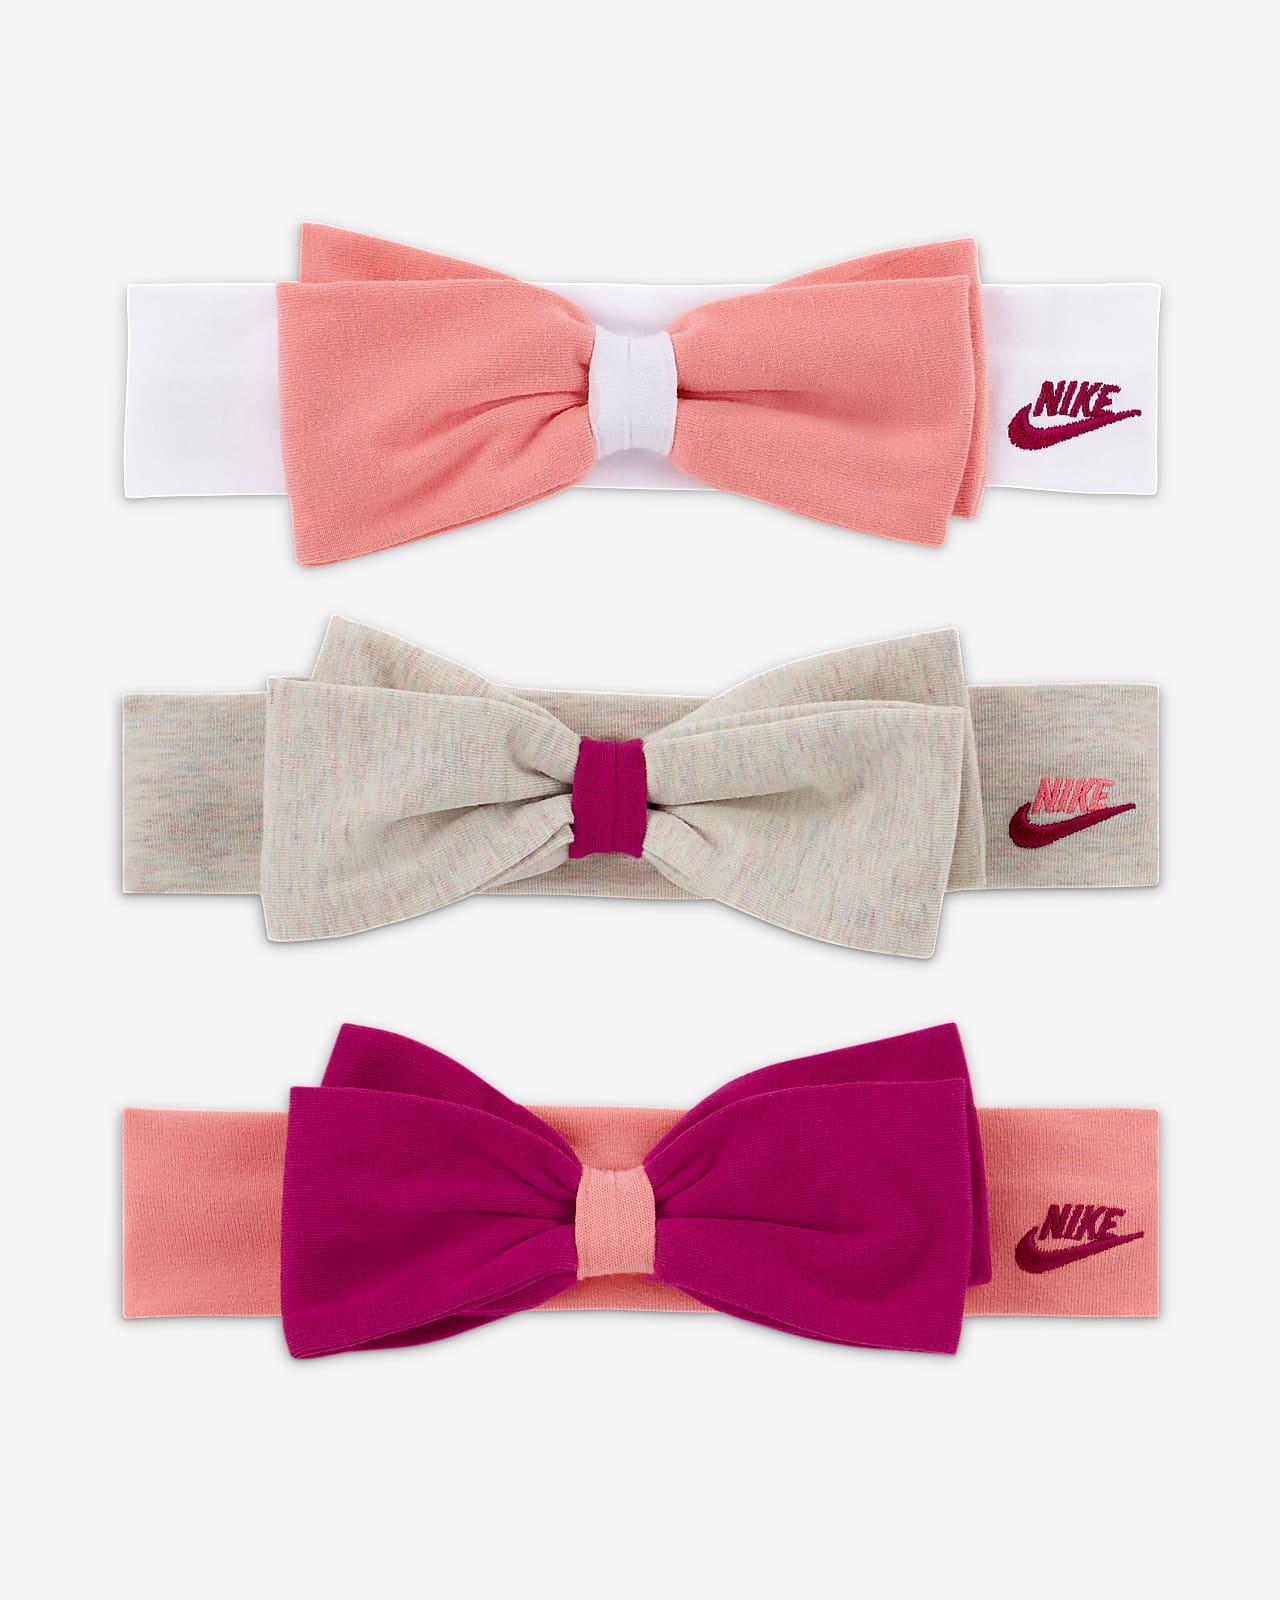 Nike Baby Headbands (3-Pack)